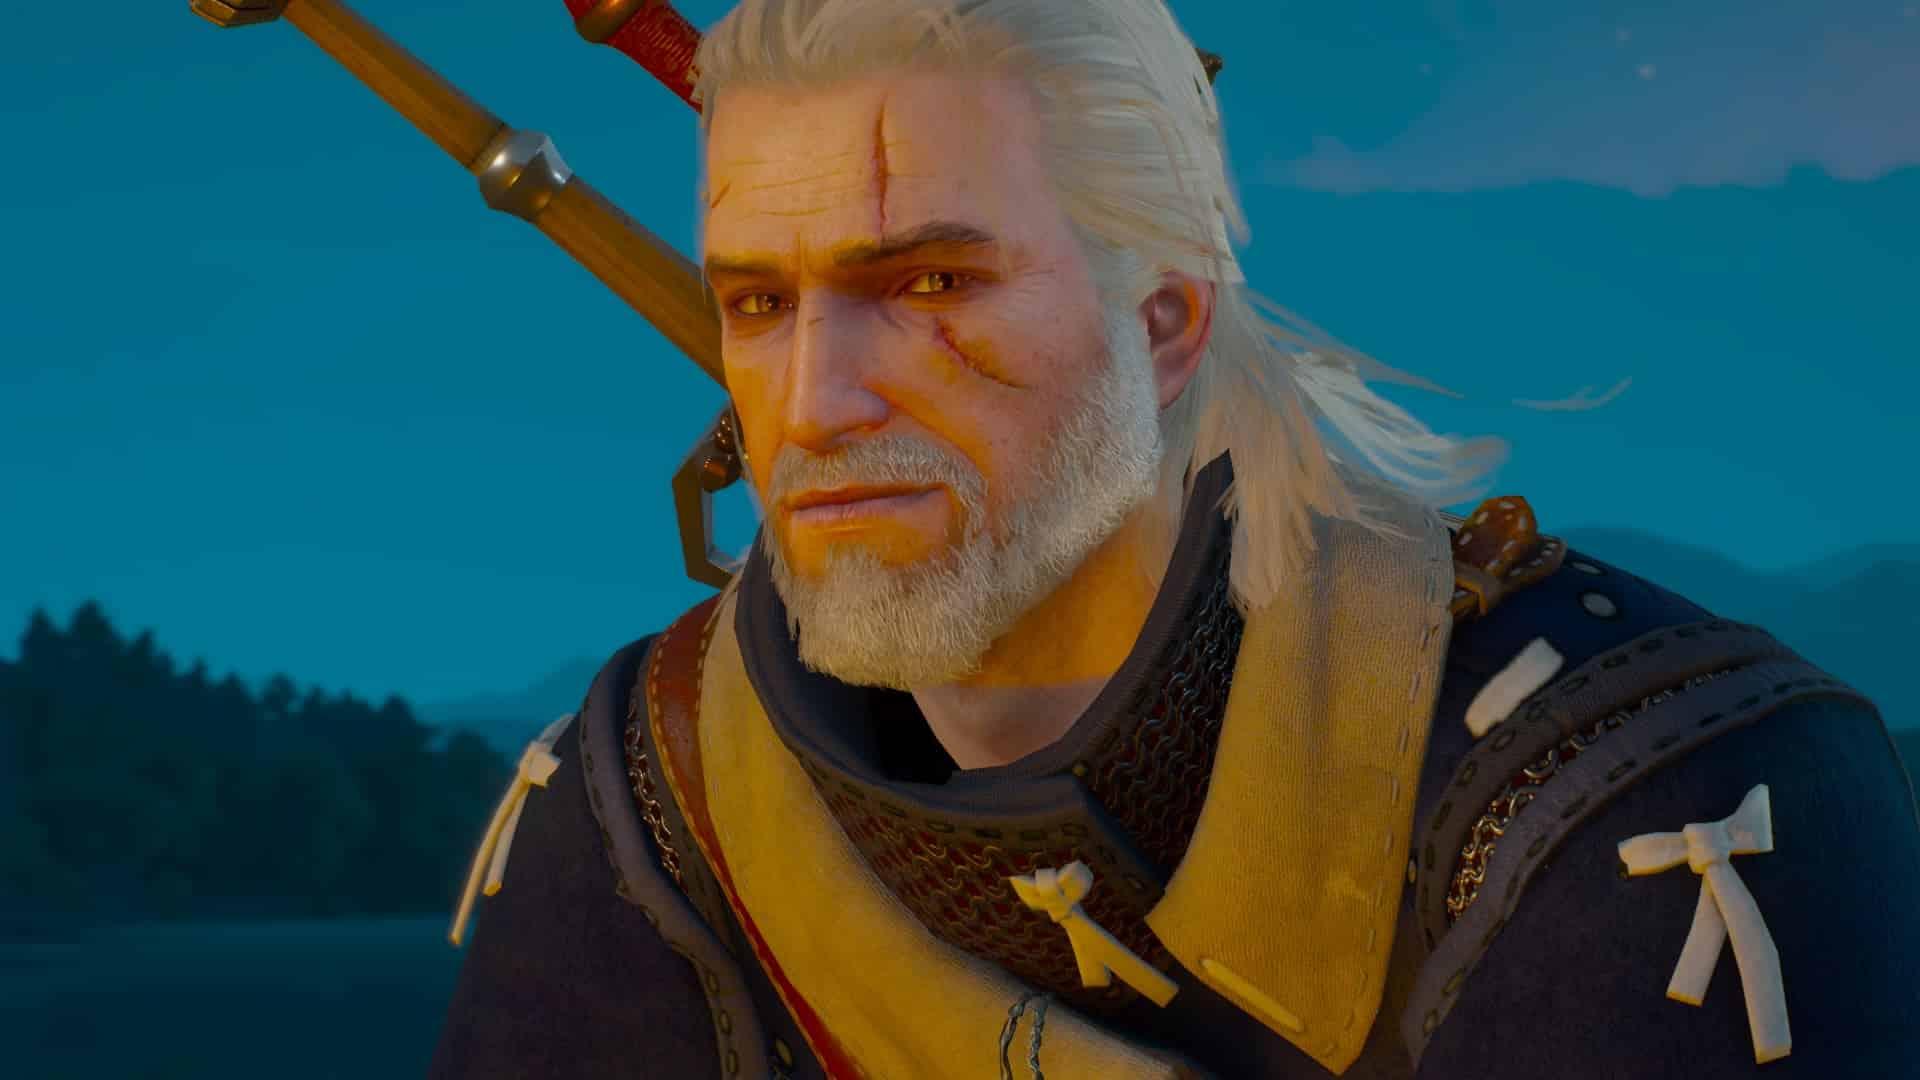 Geralt The Witcher 3 CD Projekt RED